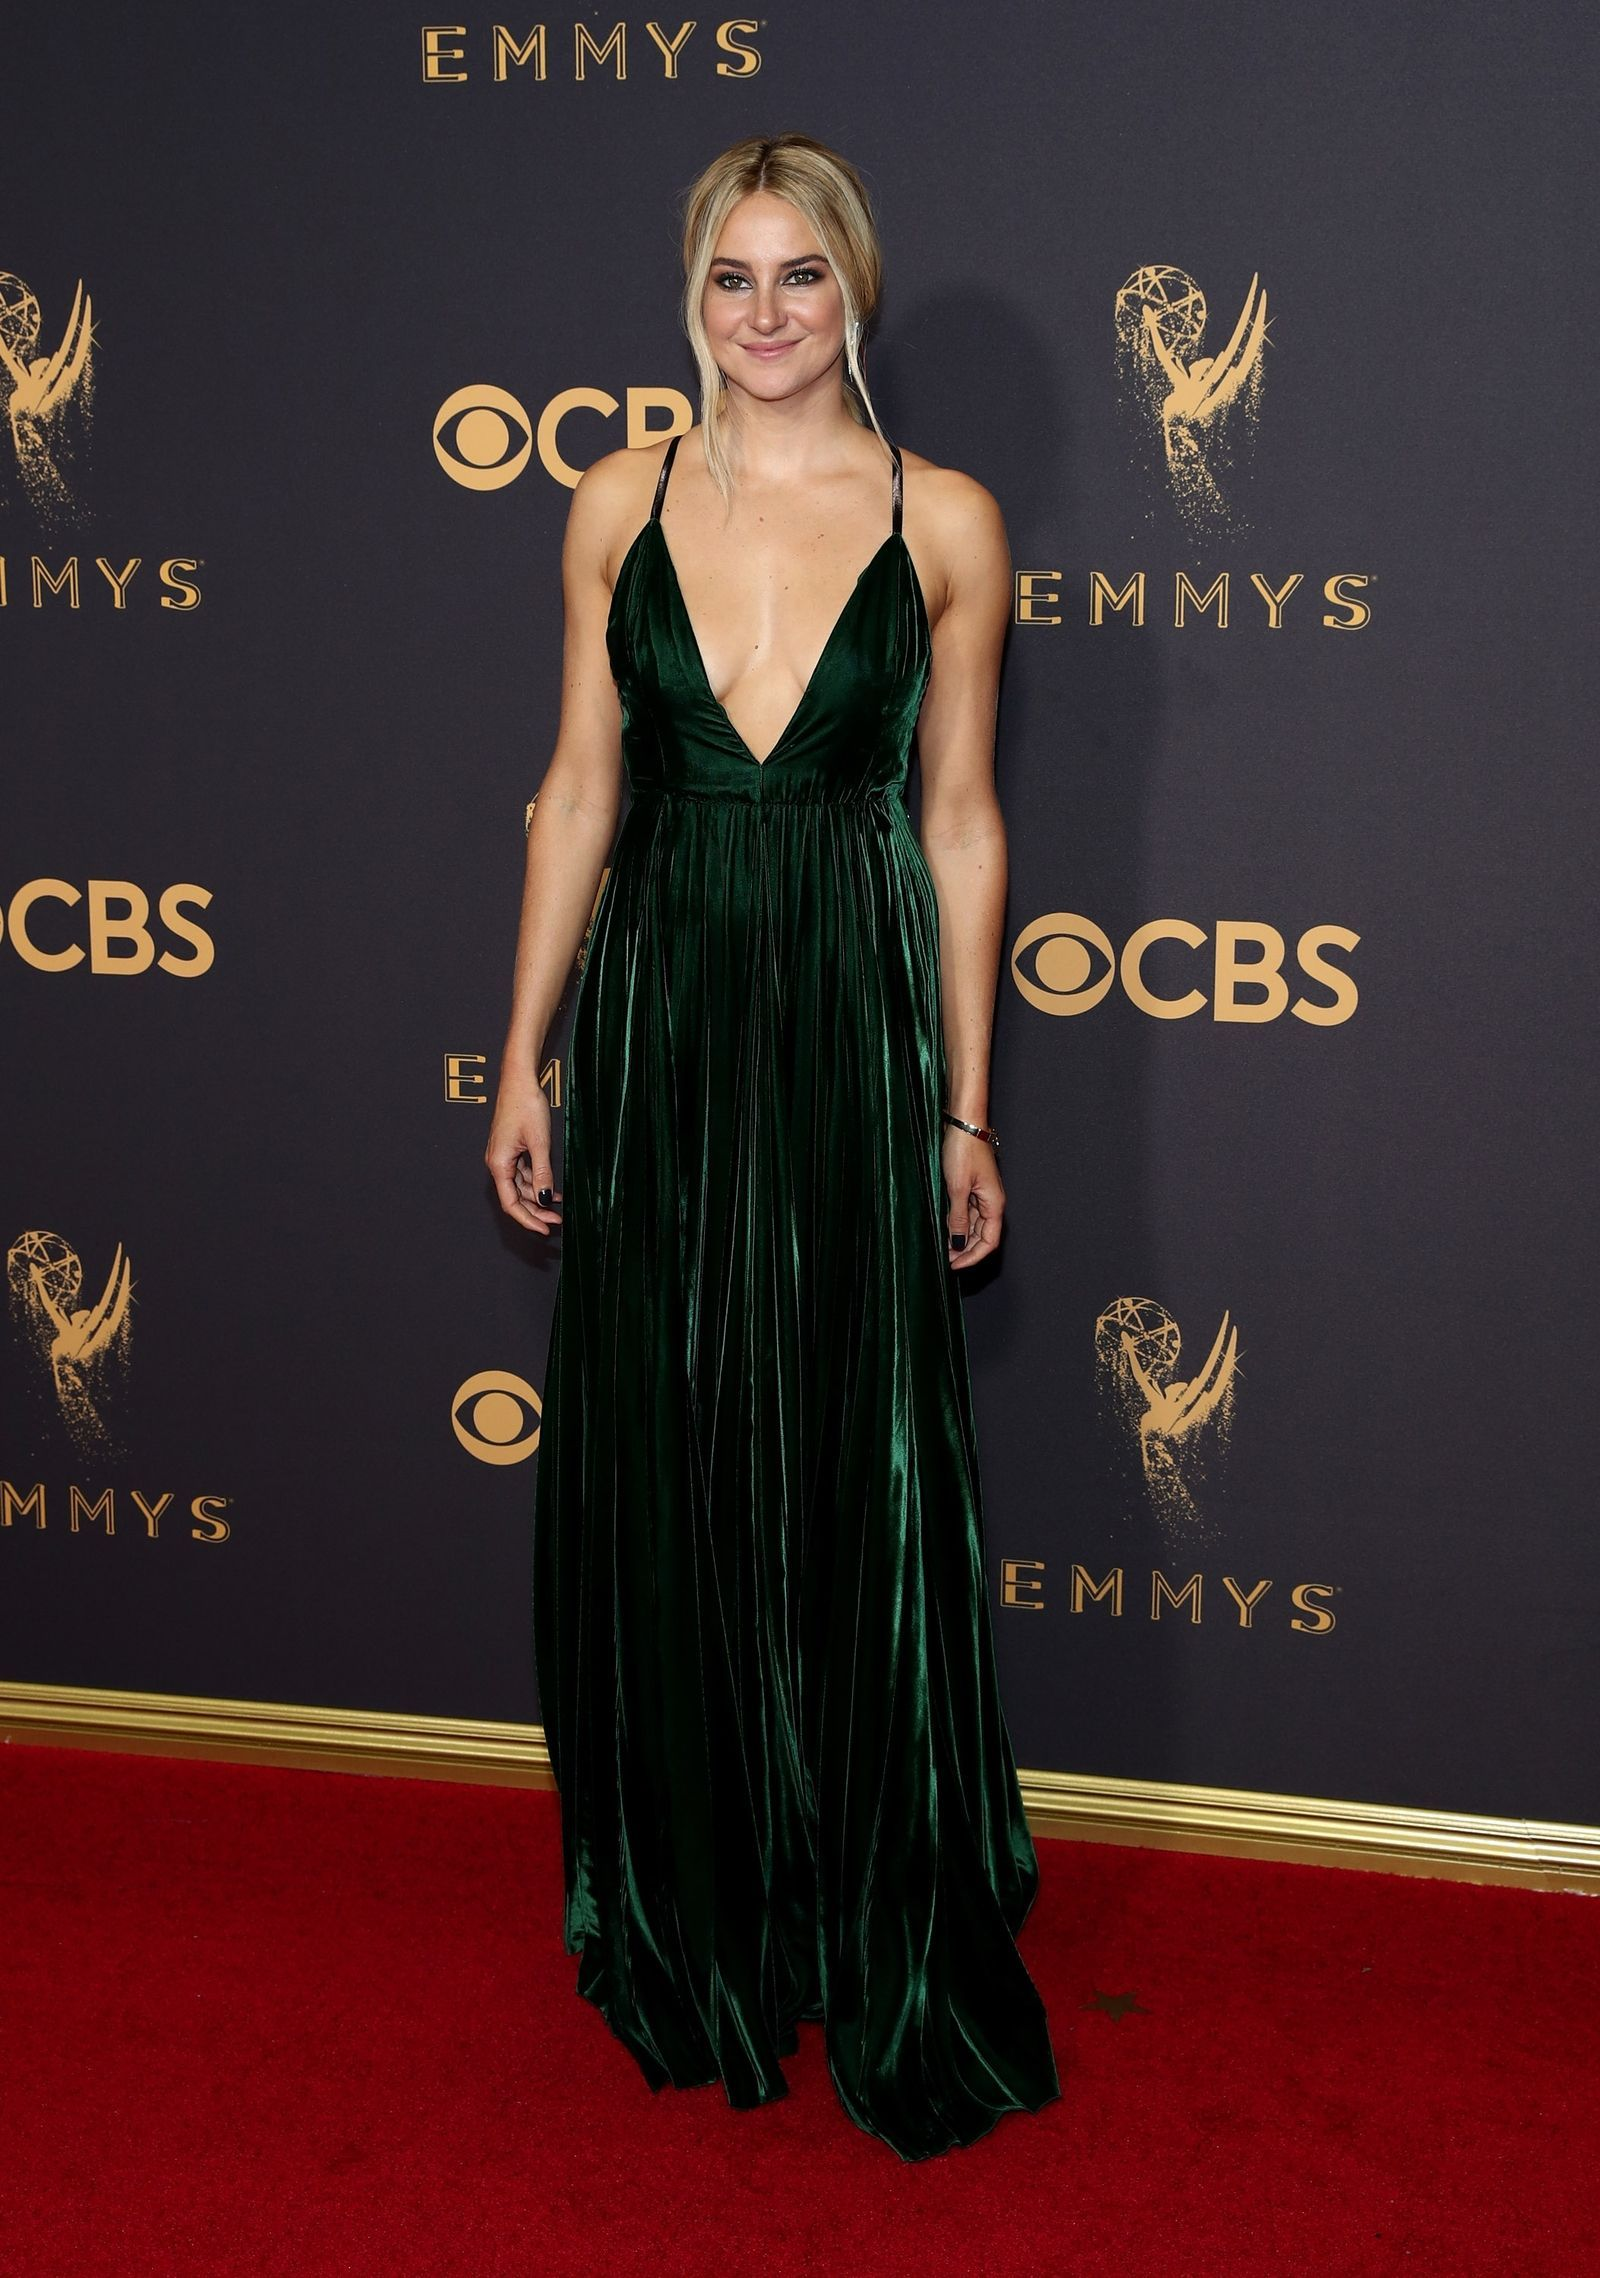 0a7d1b79b2 Shailene Woodley Shailene Woodley, Plunging Neckline, Red Carpet Dresses,  Celebrity Style, Prom